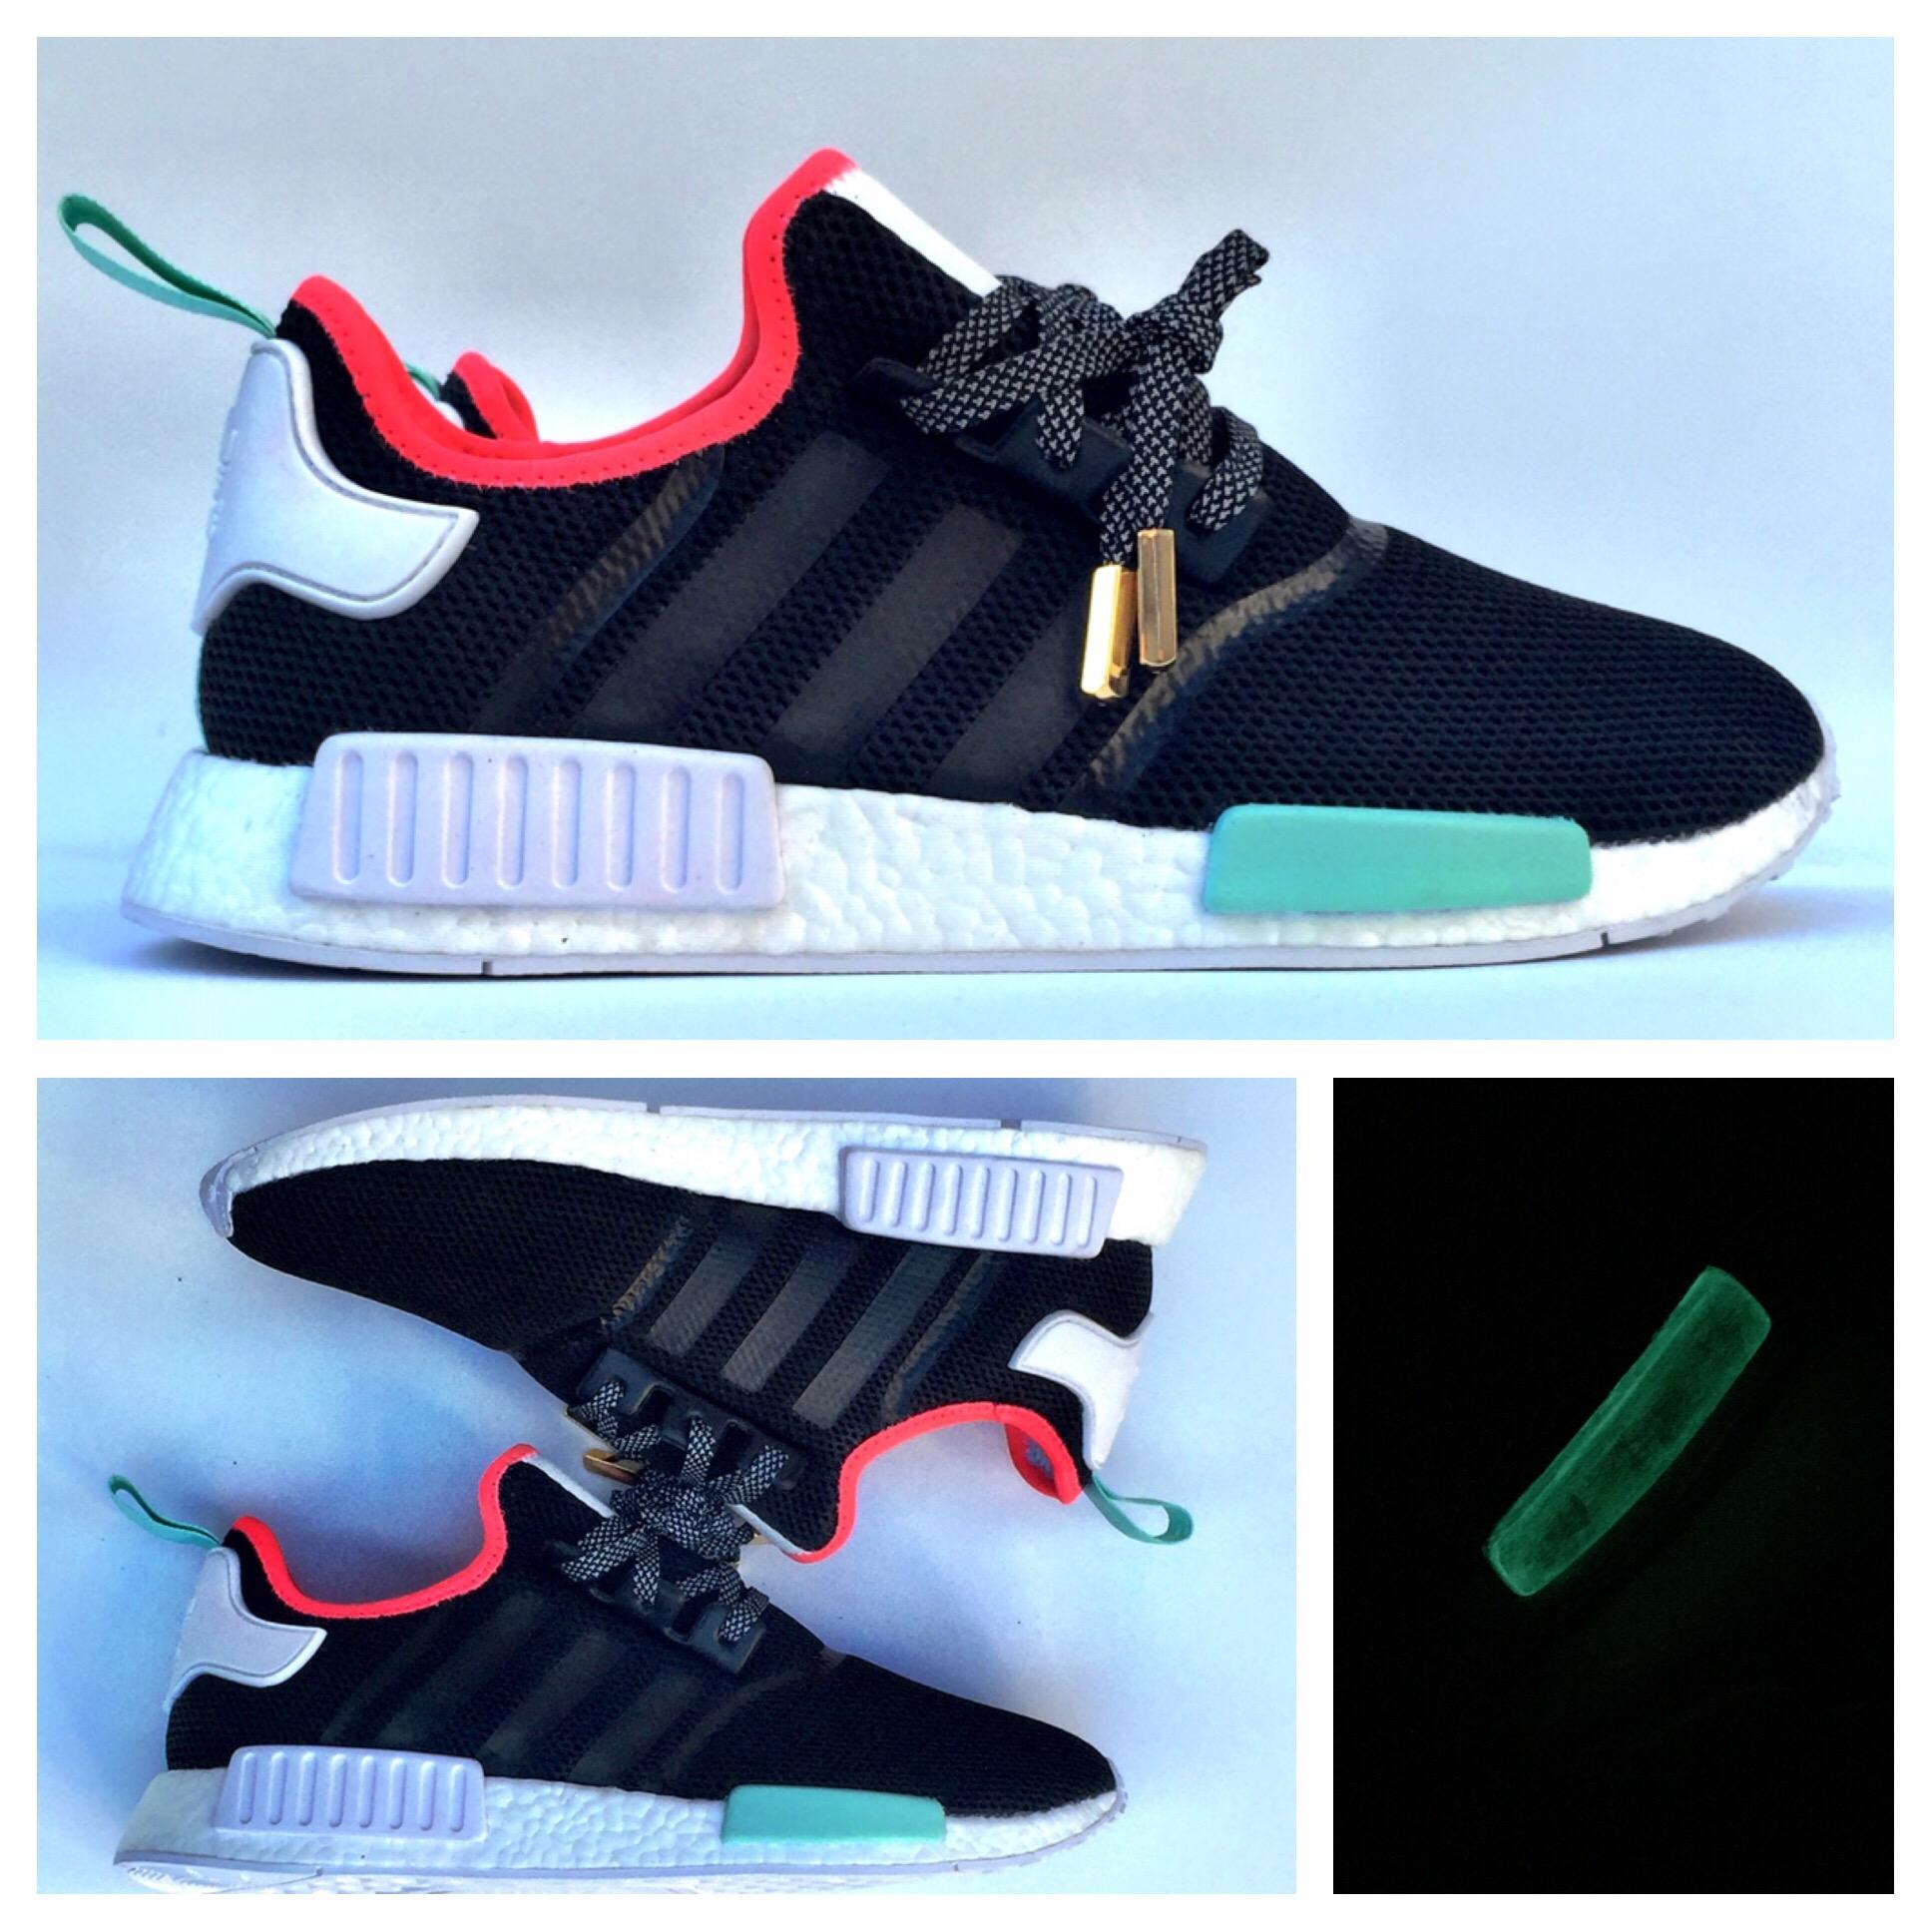 adidas nmd yeezy boost